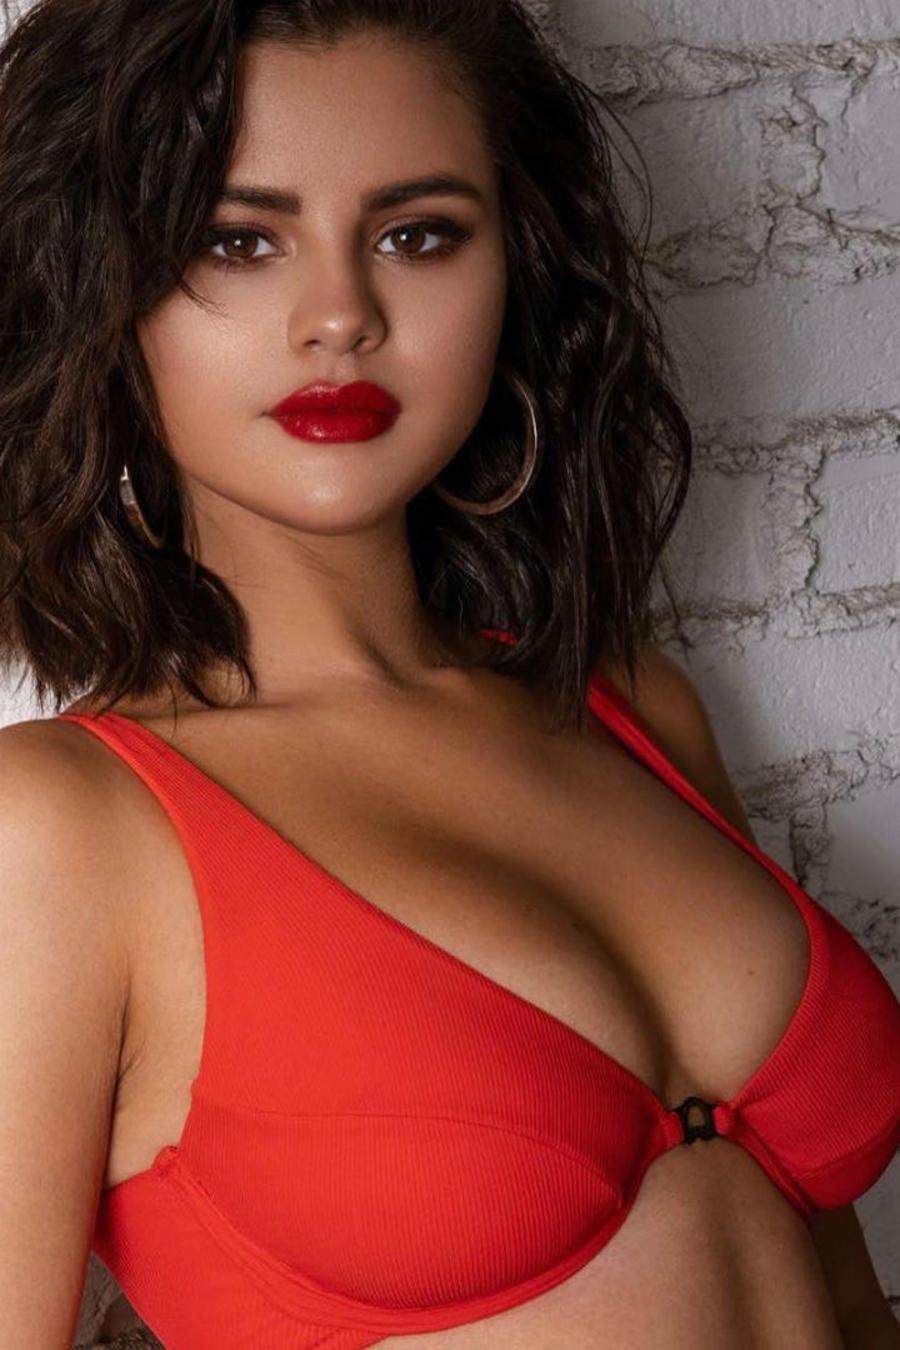 Selena Gomez en traje de baño rojo